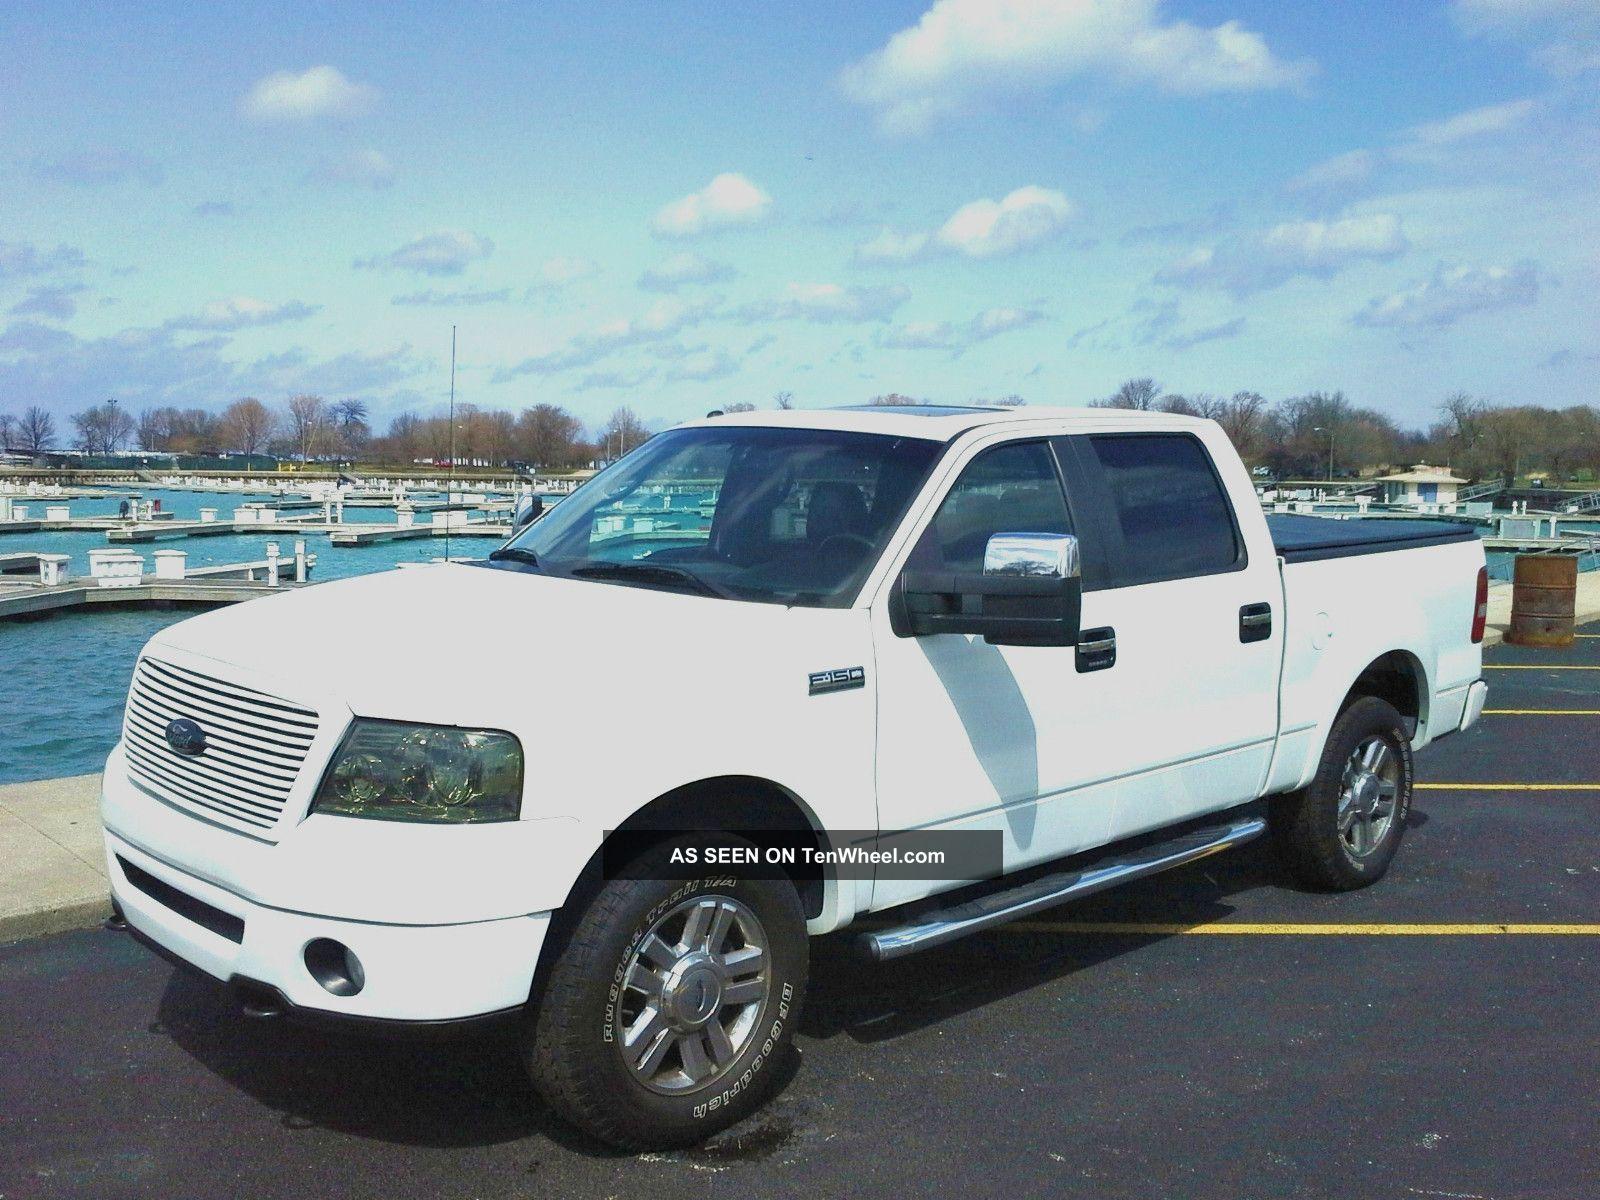 2008 ford f 150 lariat crew cab 5 4l 4x4 loaded. Black Bedroom Furniture Sets. Home Design Ideas